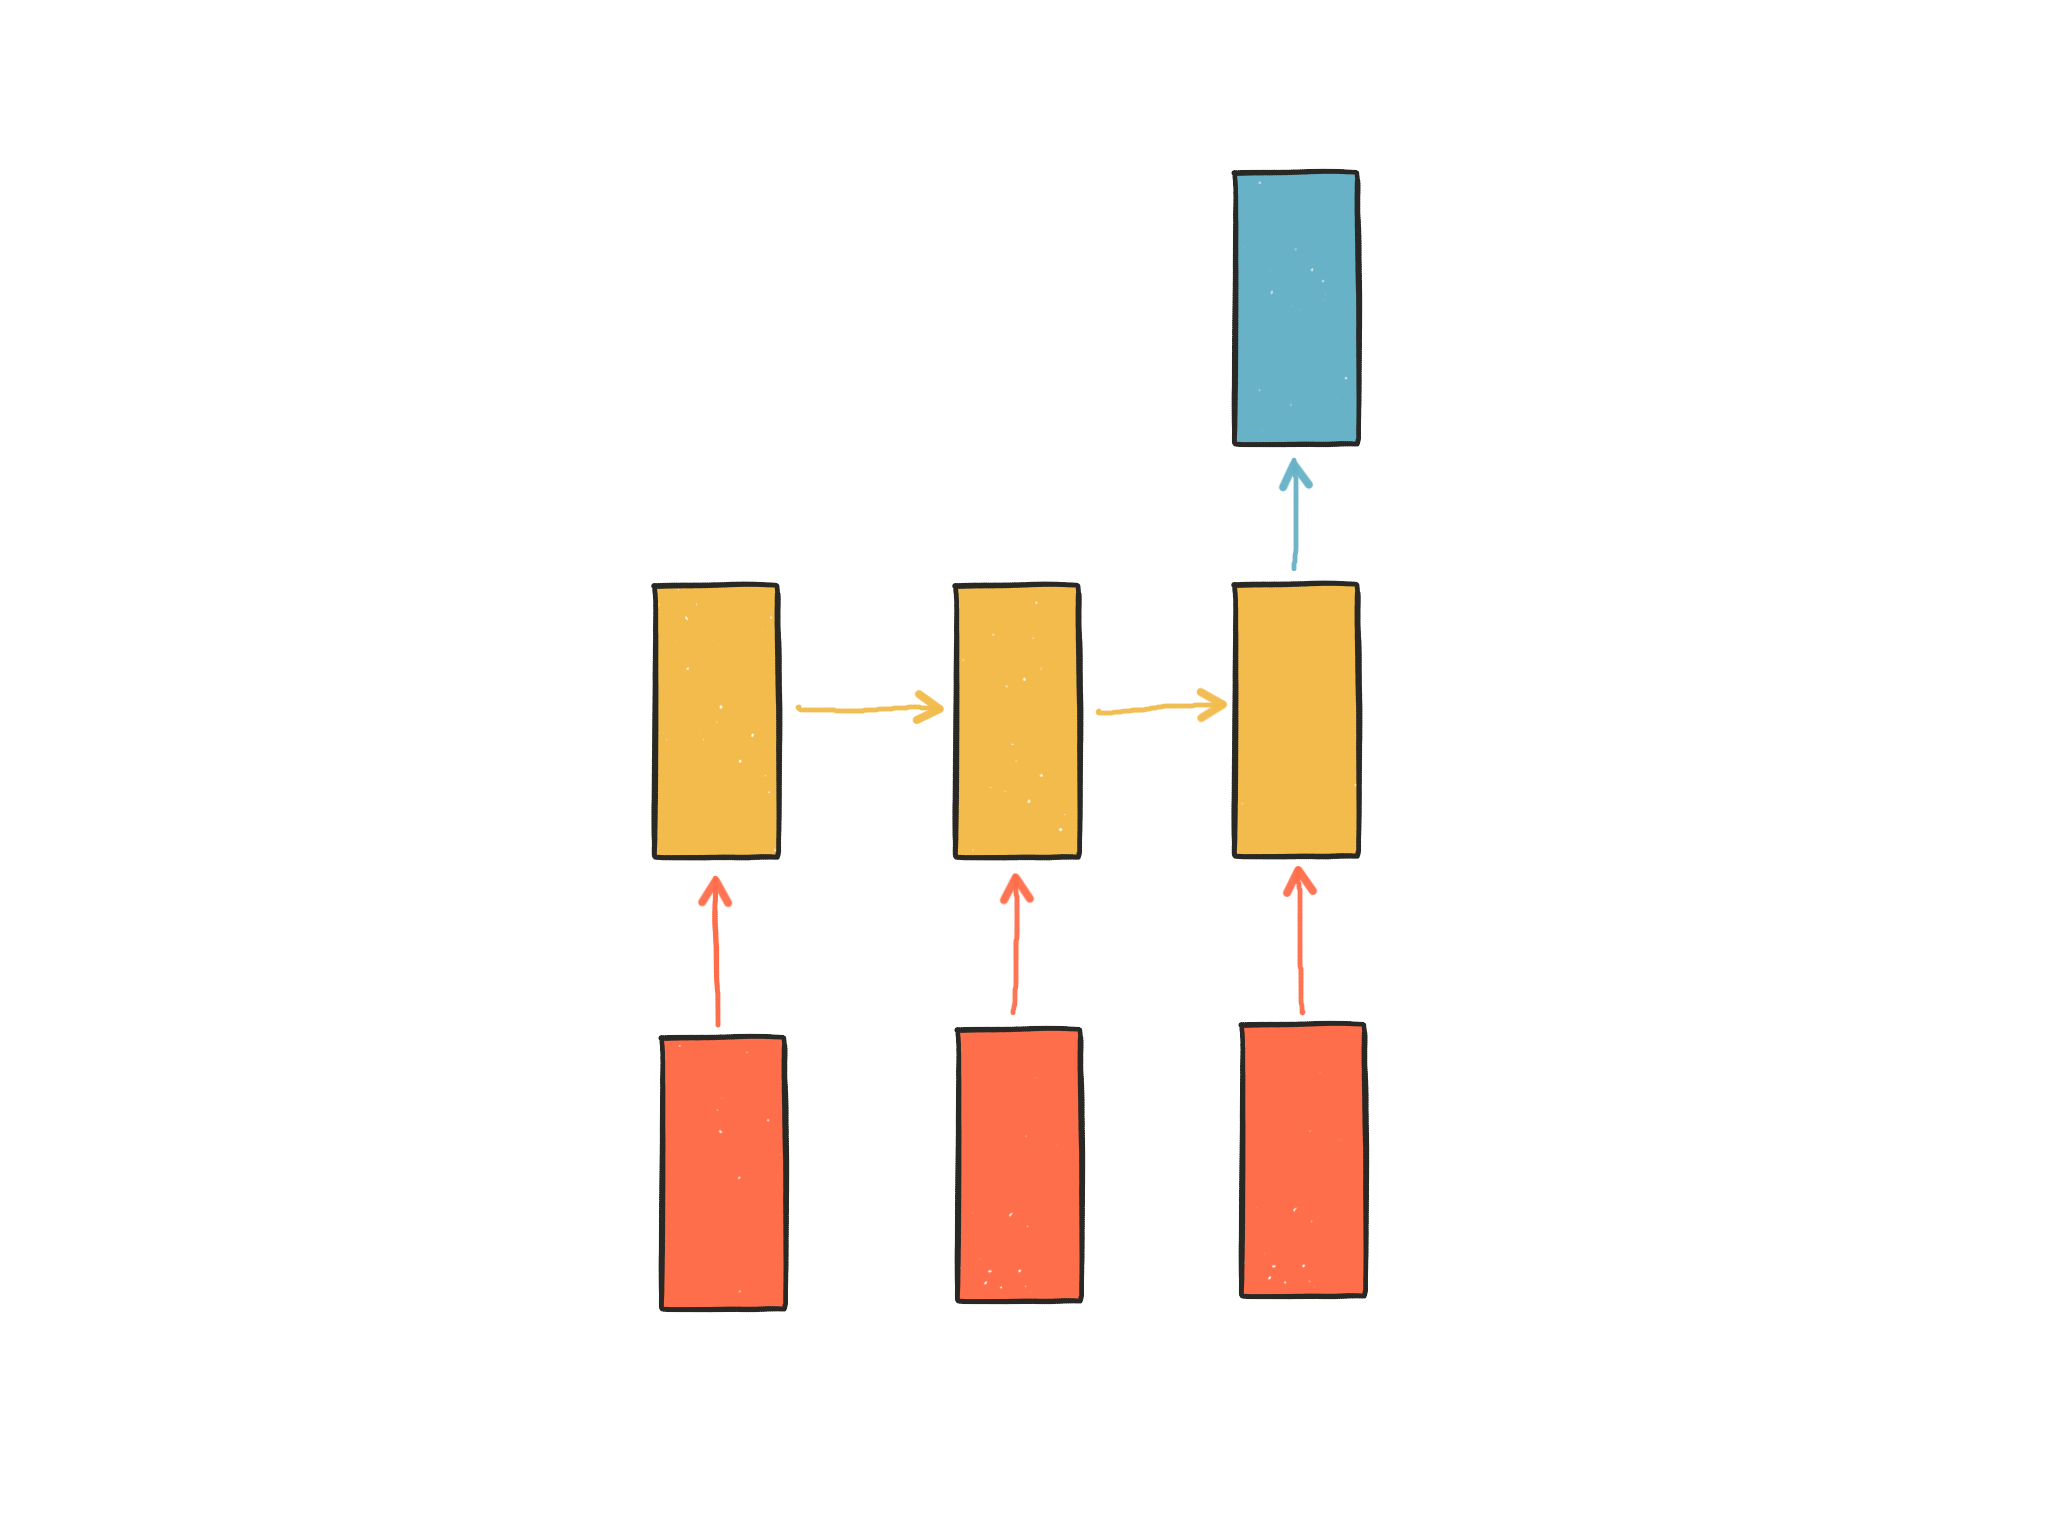 RNN 다이어그램